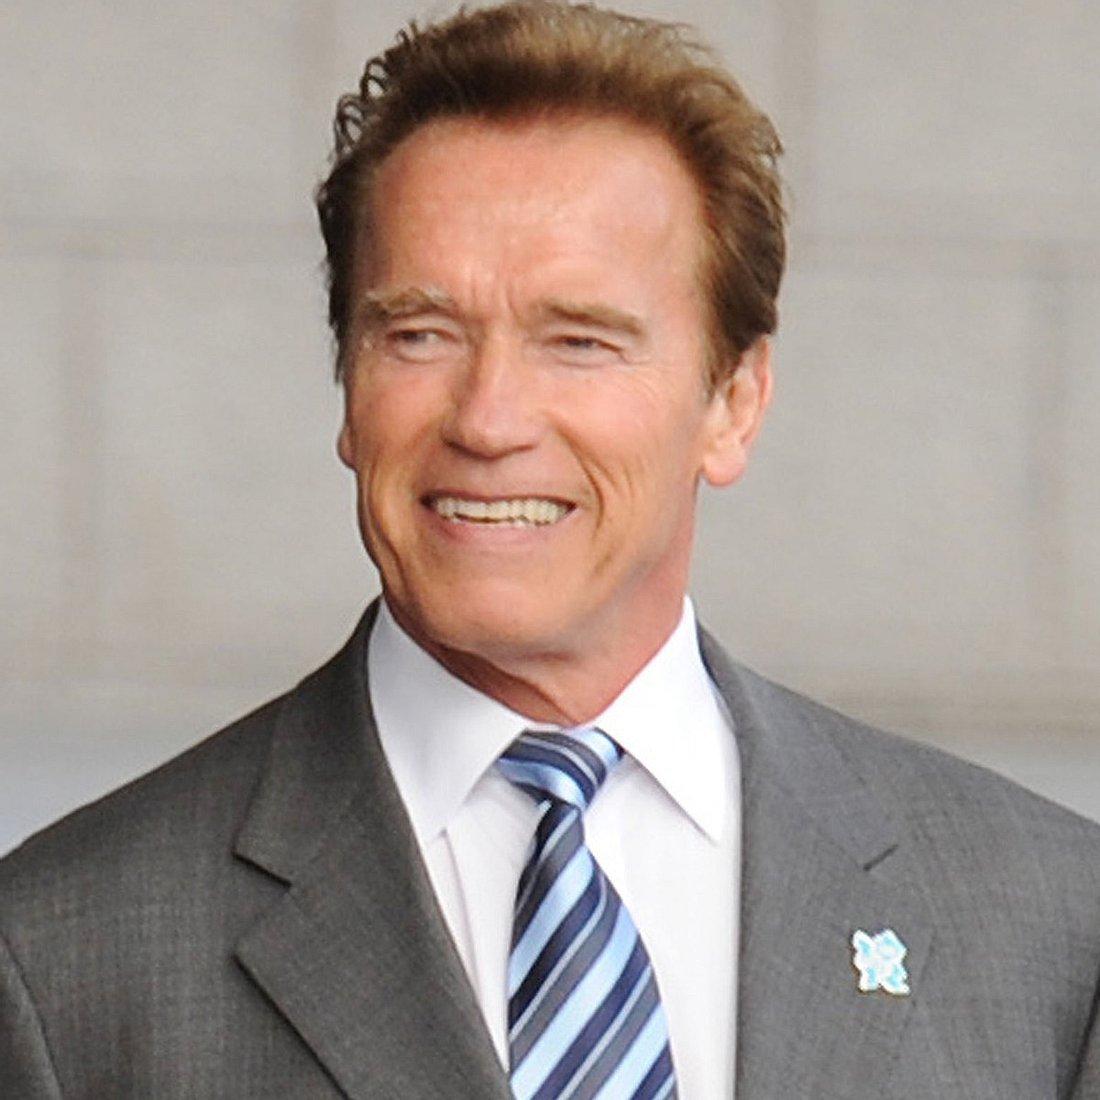 Arnold Schwarzenegger steht ein Rosenkrieg bevor